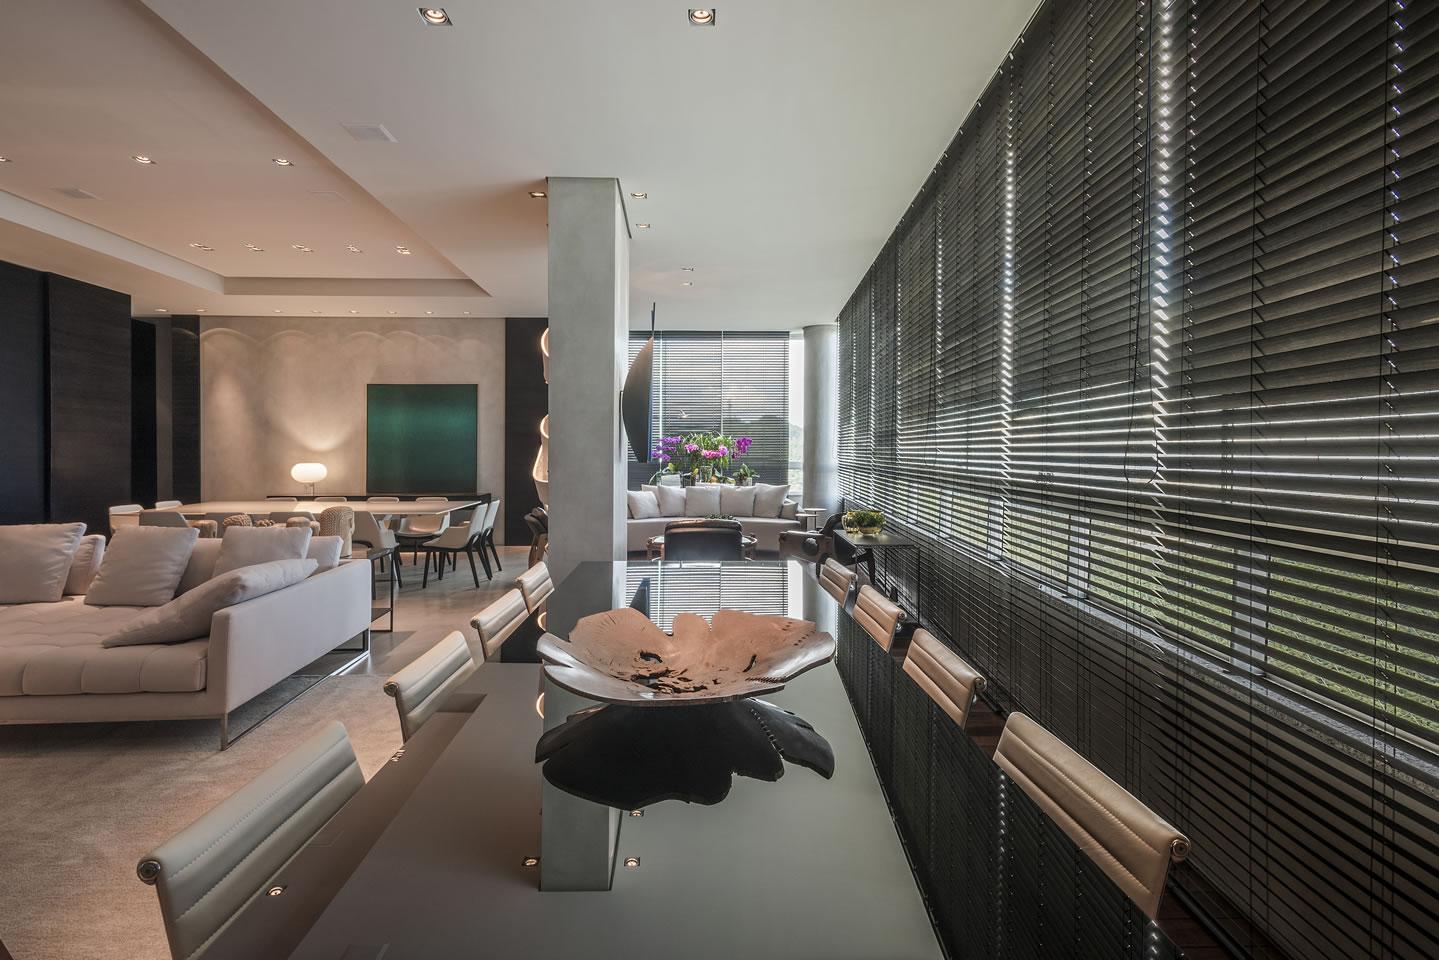 Marcia-Carvalhaes-Apartamento-KB-023